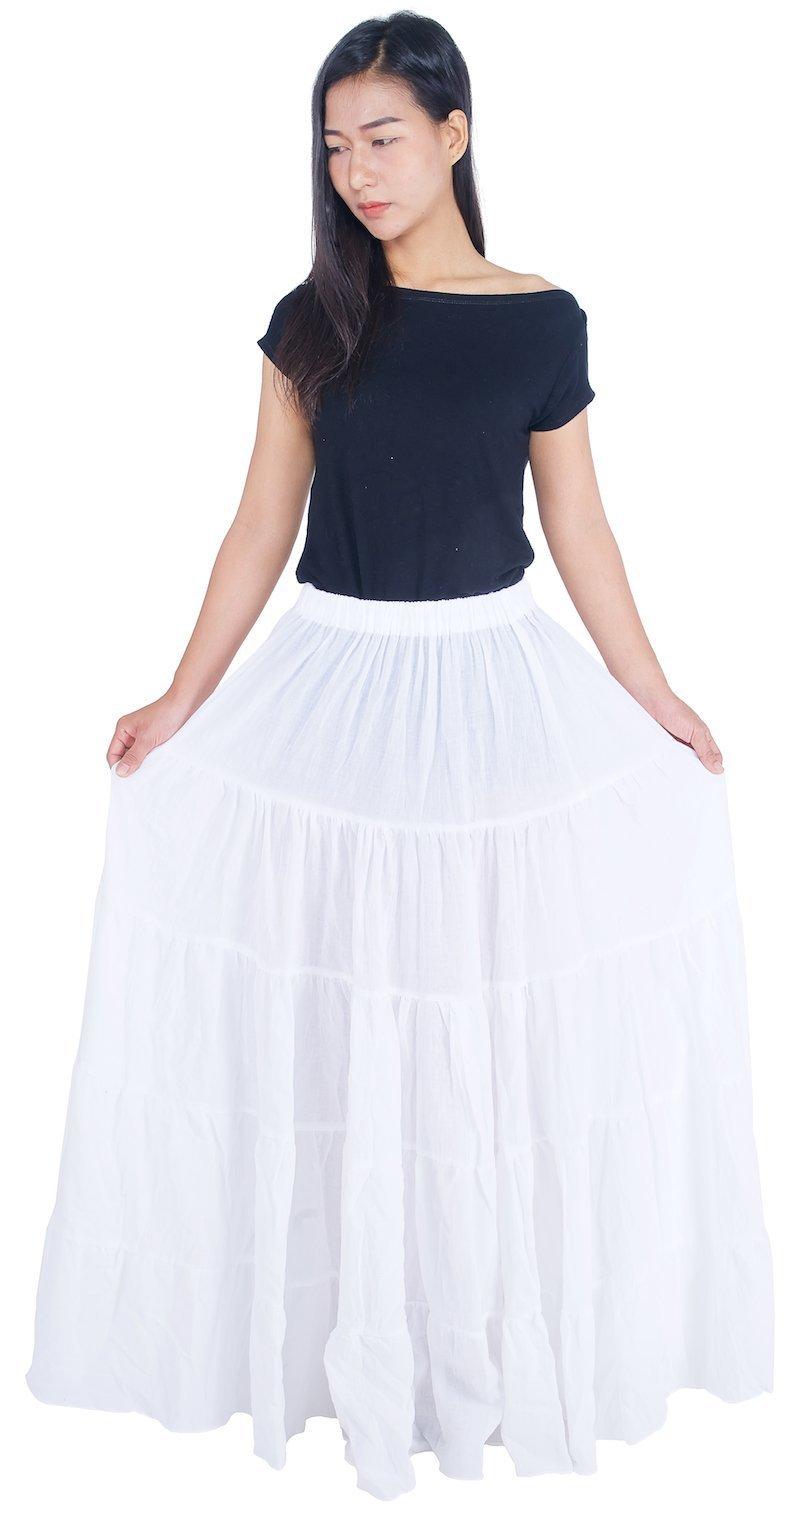 Lannaclothesdesign Women's Cotton Long Ruffle Full Circle Long Skirts Maxi Skirt One Size White